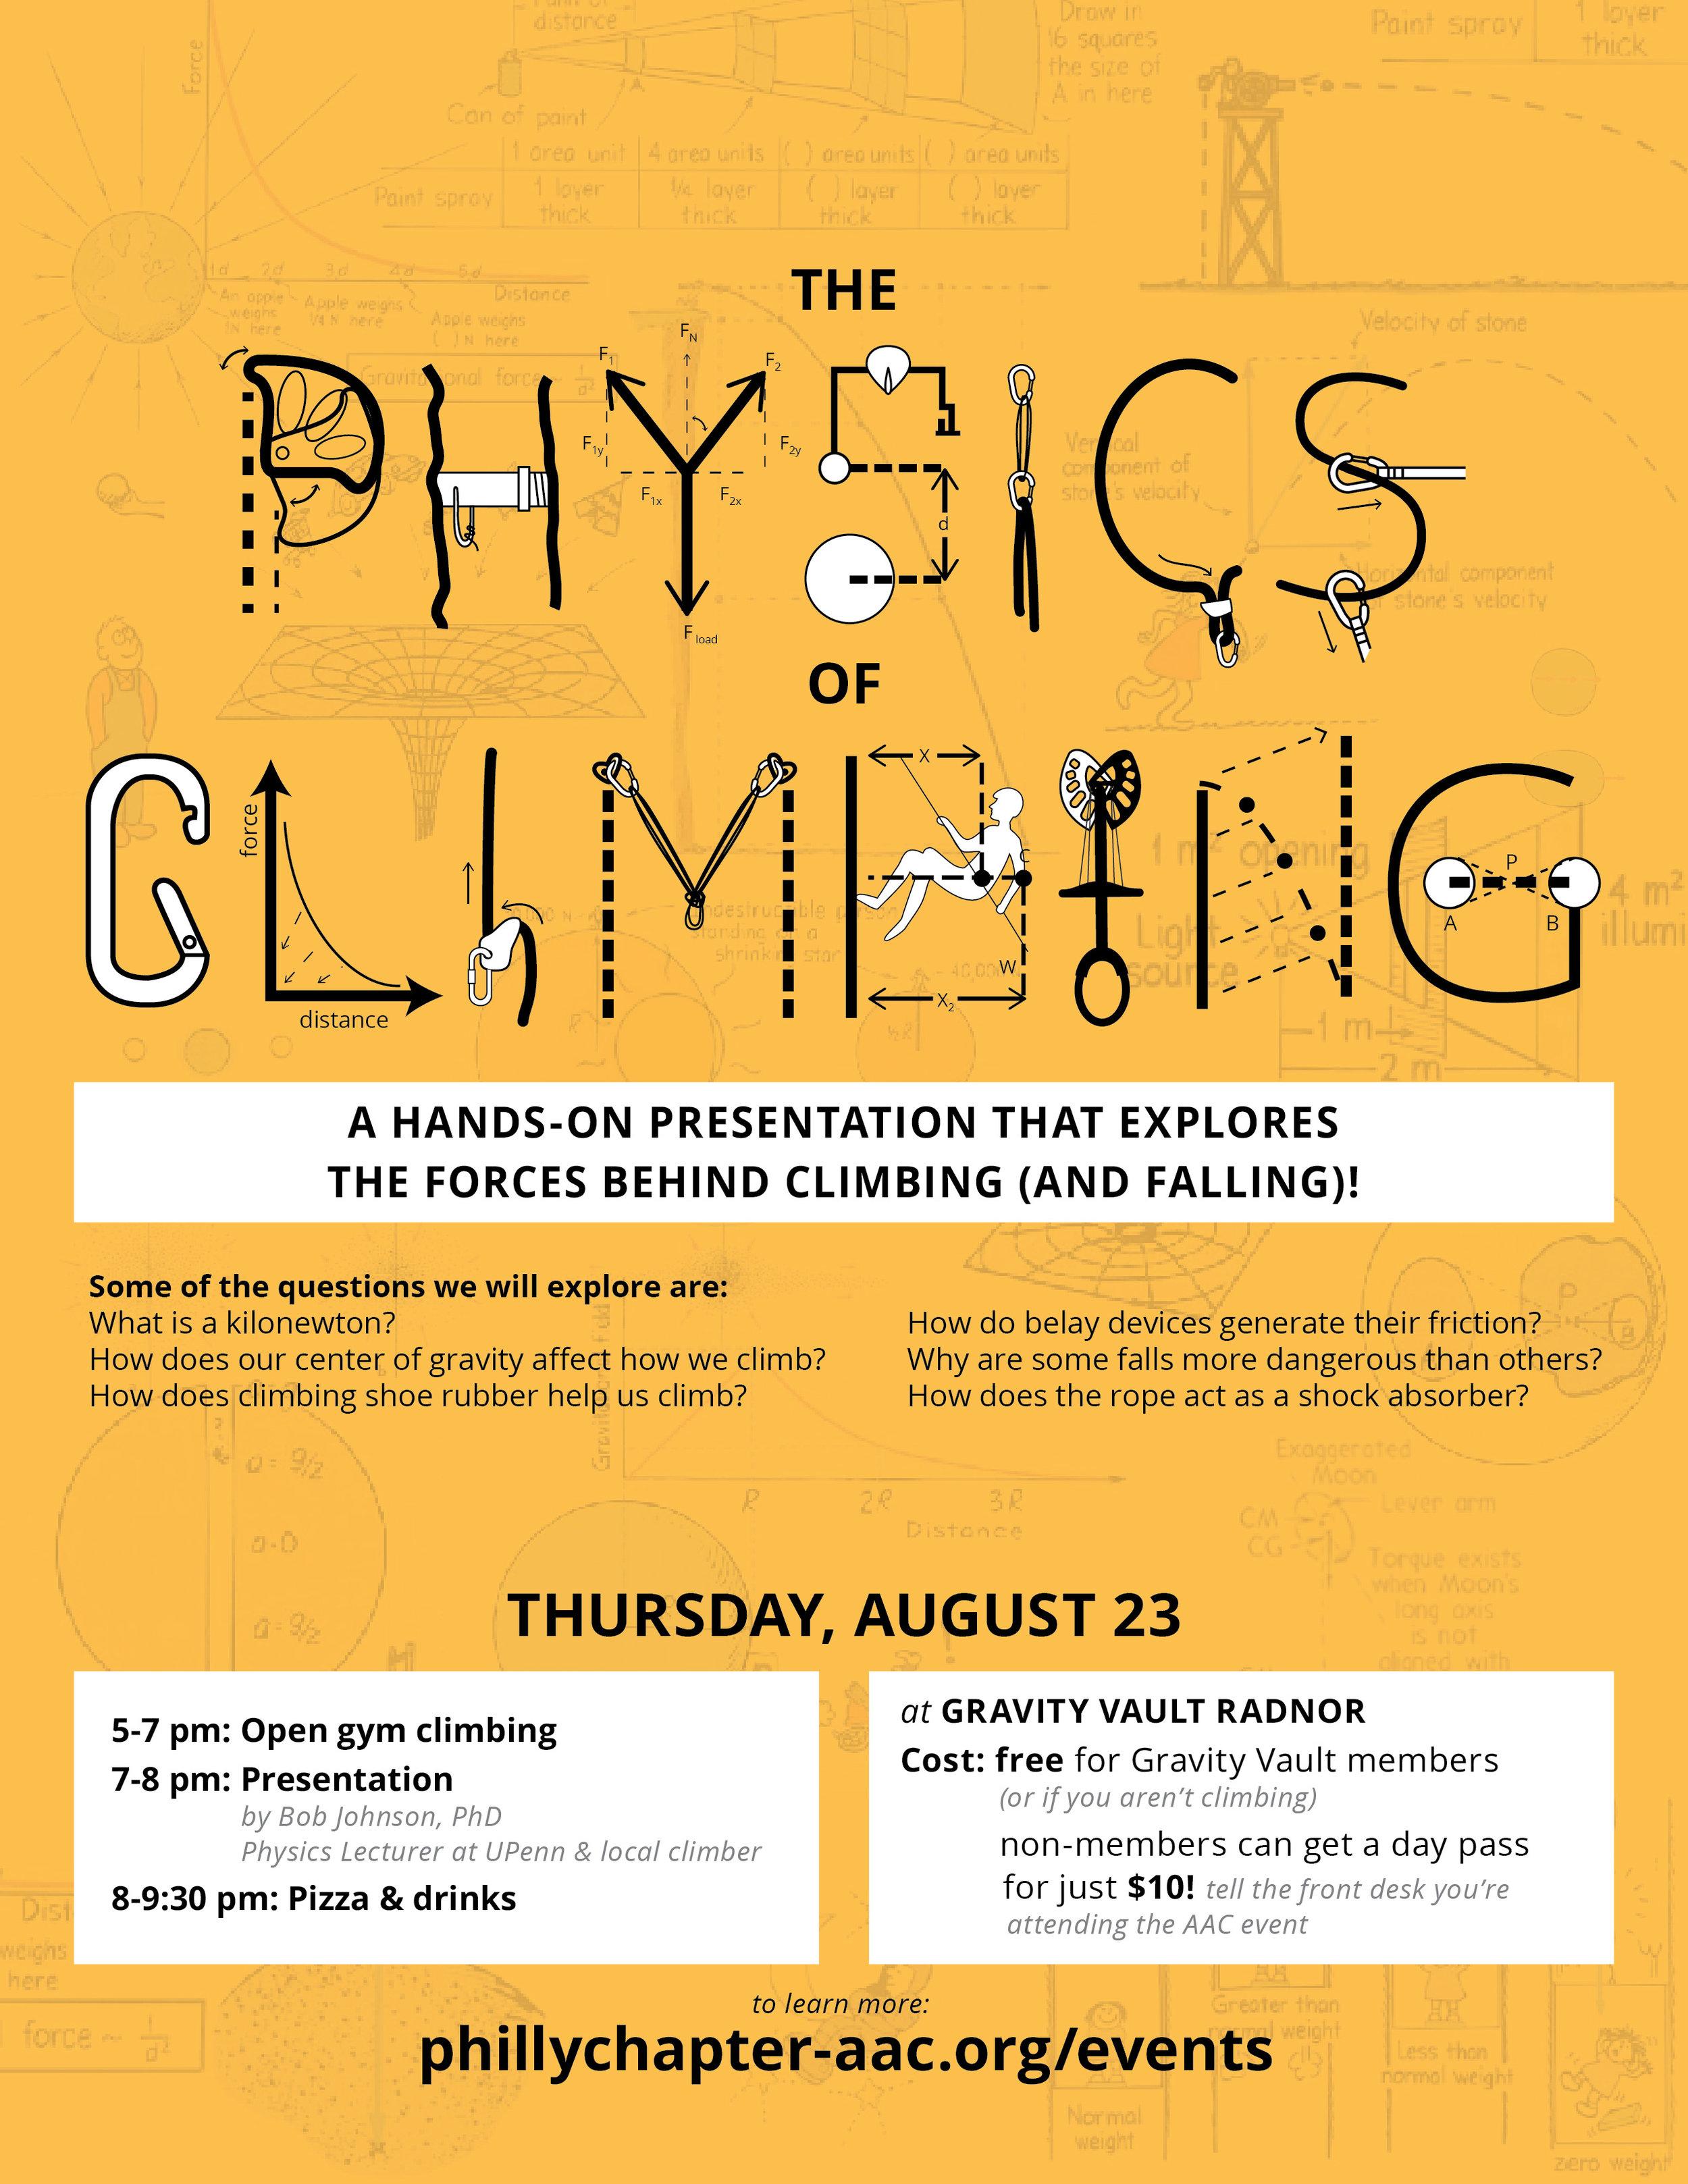 physics of climbing full poster-01.jpg